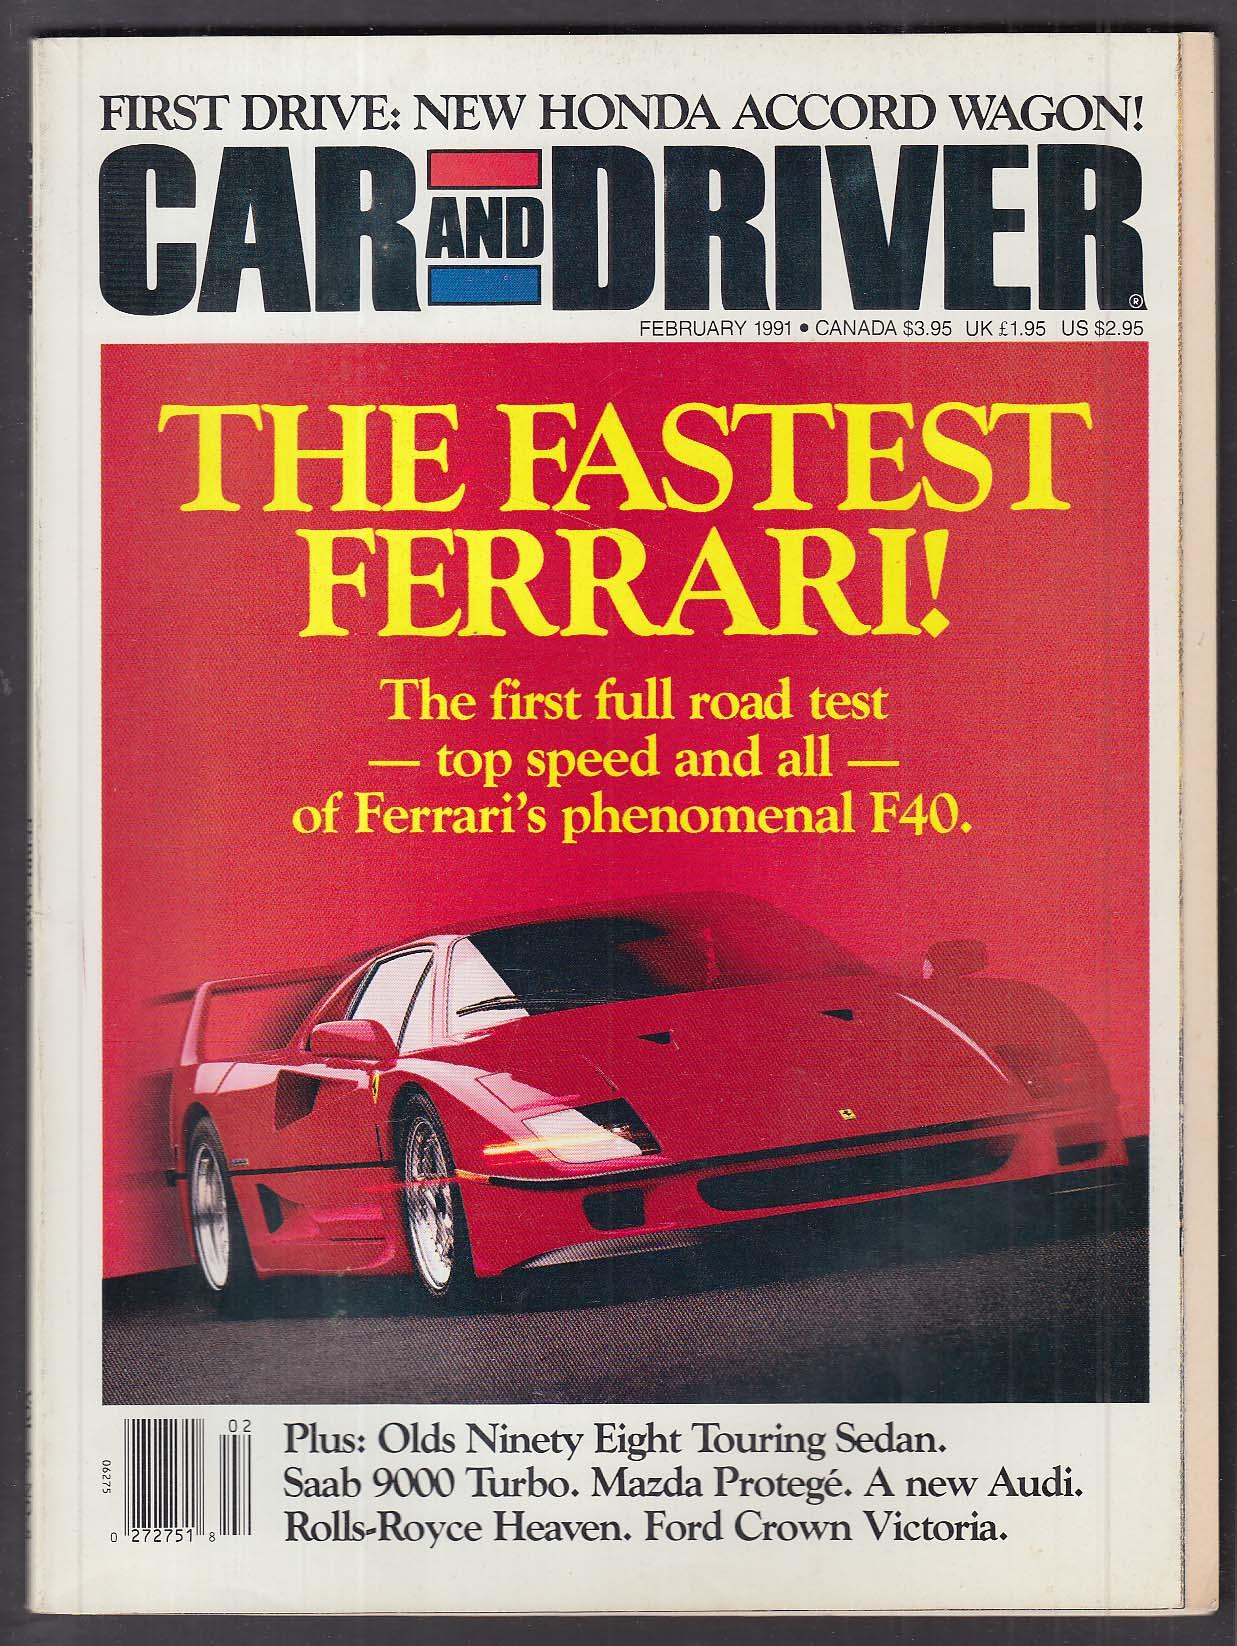 CAR & DRIVER Ferrari F40 Oldsmobile 98 Mazda Protégé LC Saab 9000 Turbo + 2 1991